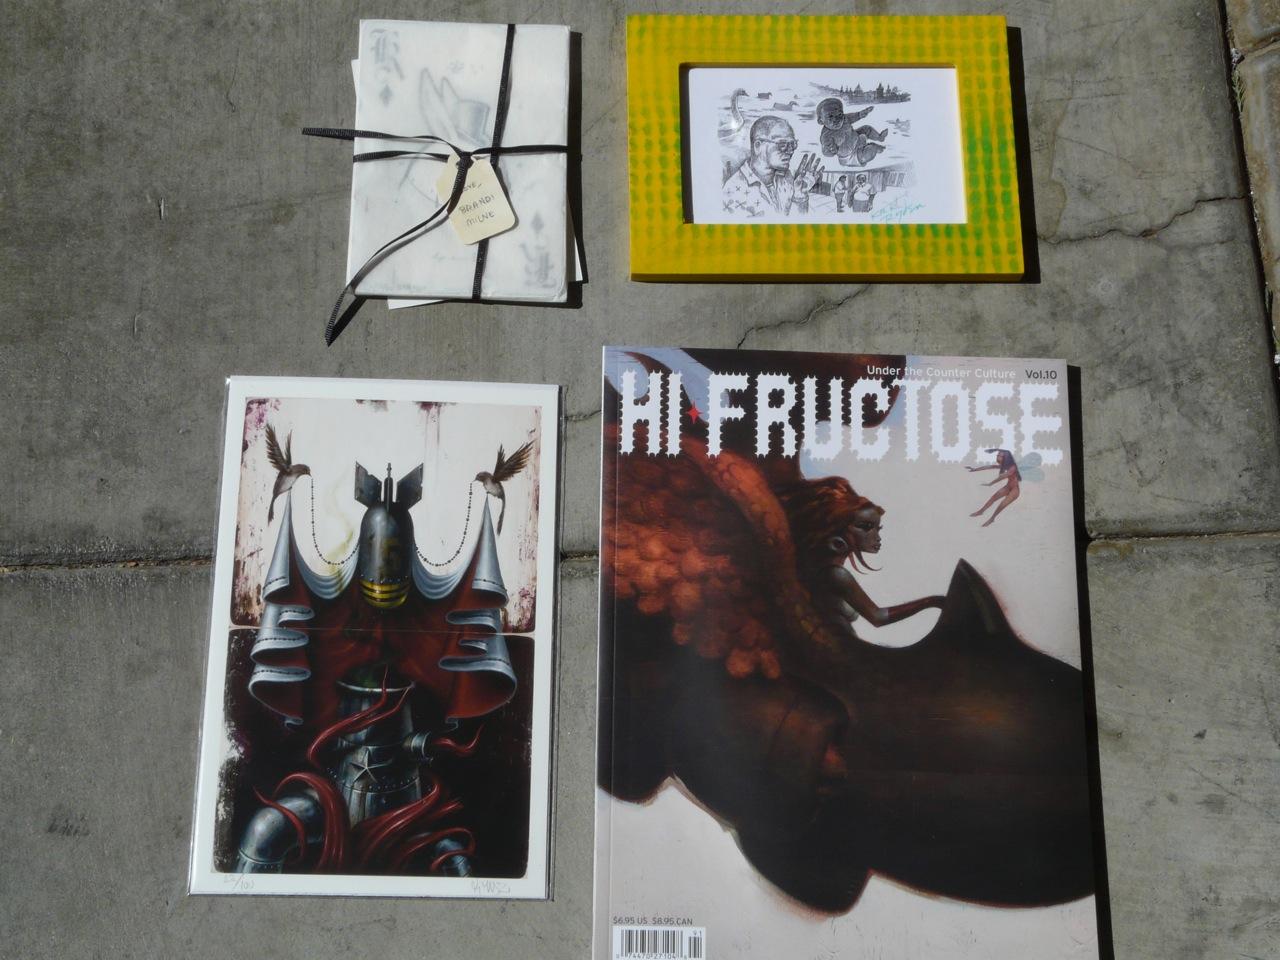 KRK Ryden print, Hi Fructose mag, KMNDZ print, Brandi Milne set